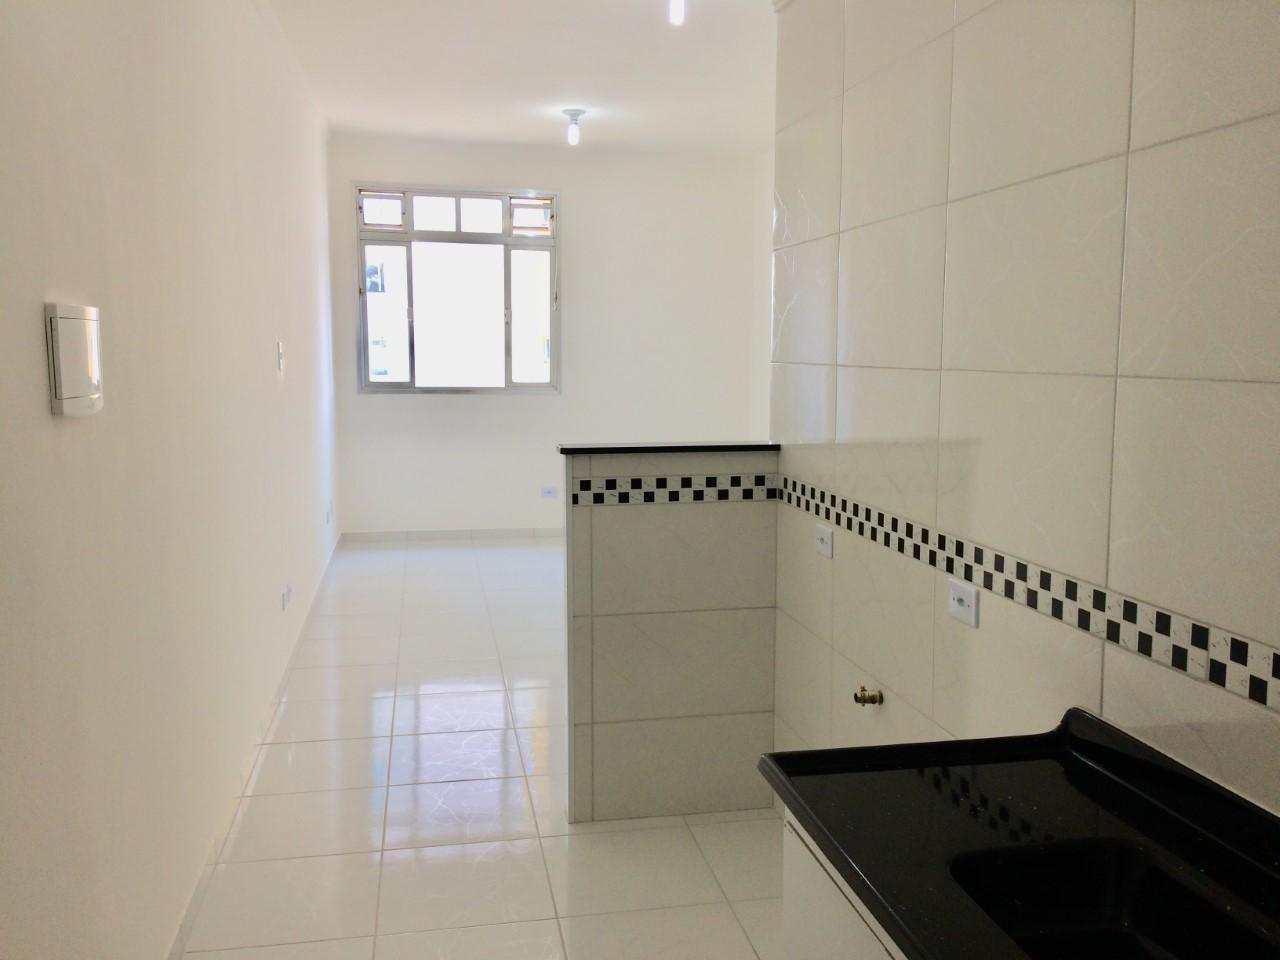 Sala Living com 1 dorm, Embaré, Santos - R$ 180 mil, Cod: 3459